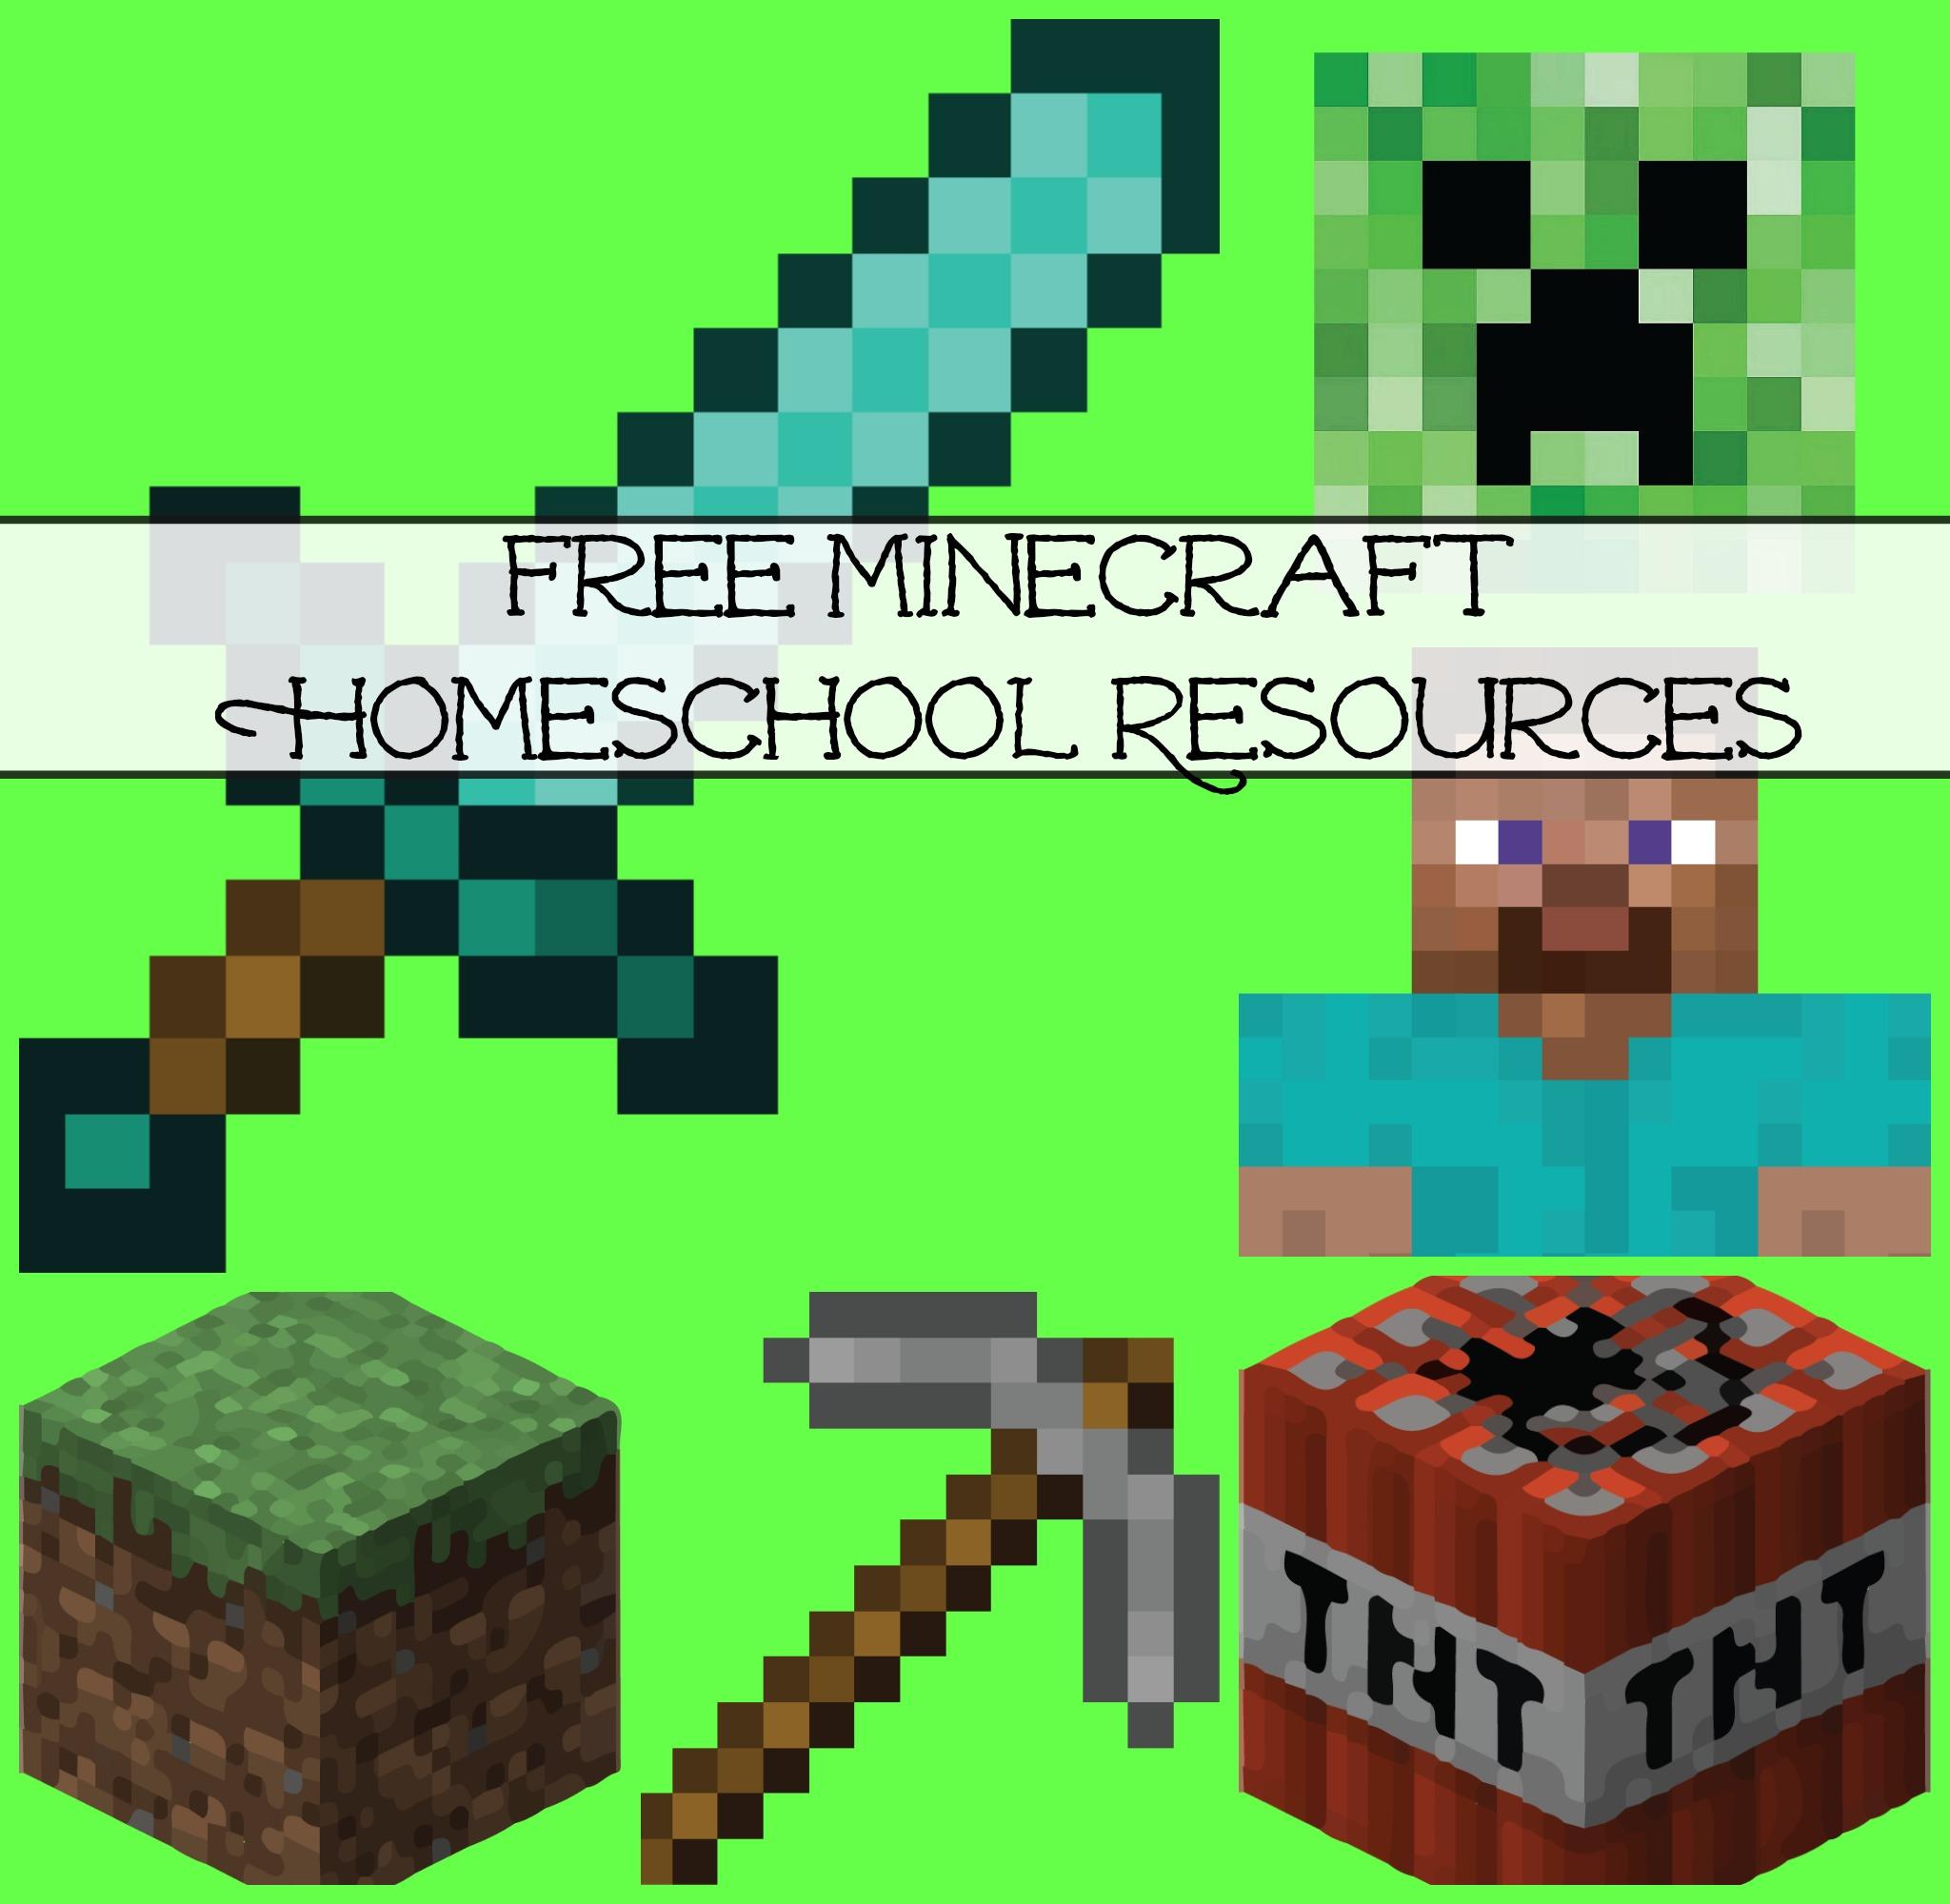 Free Minecraft Homeschool Resources: Printables, Crafts